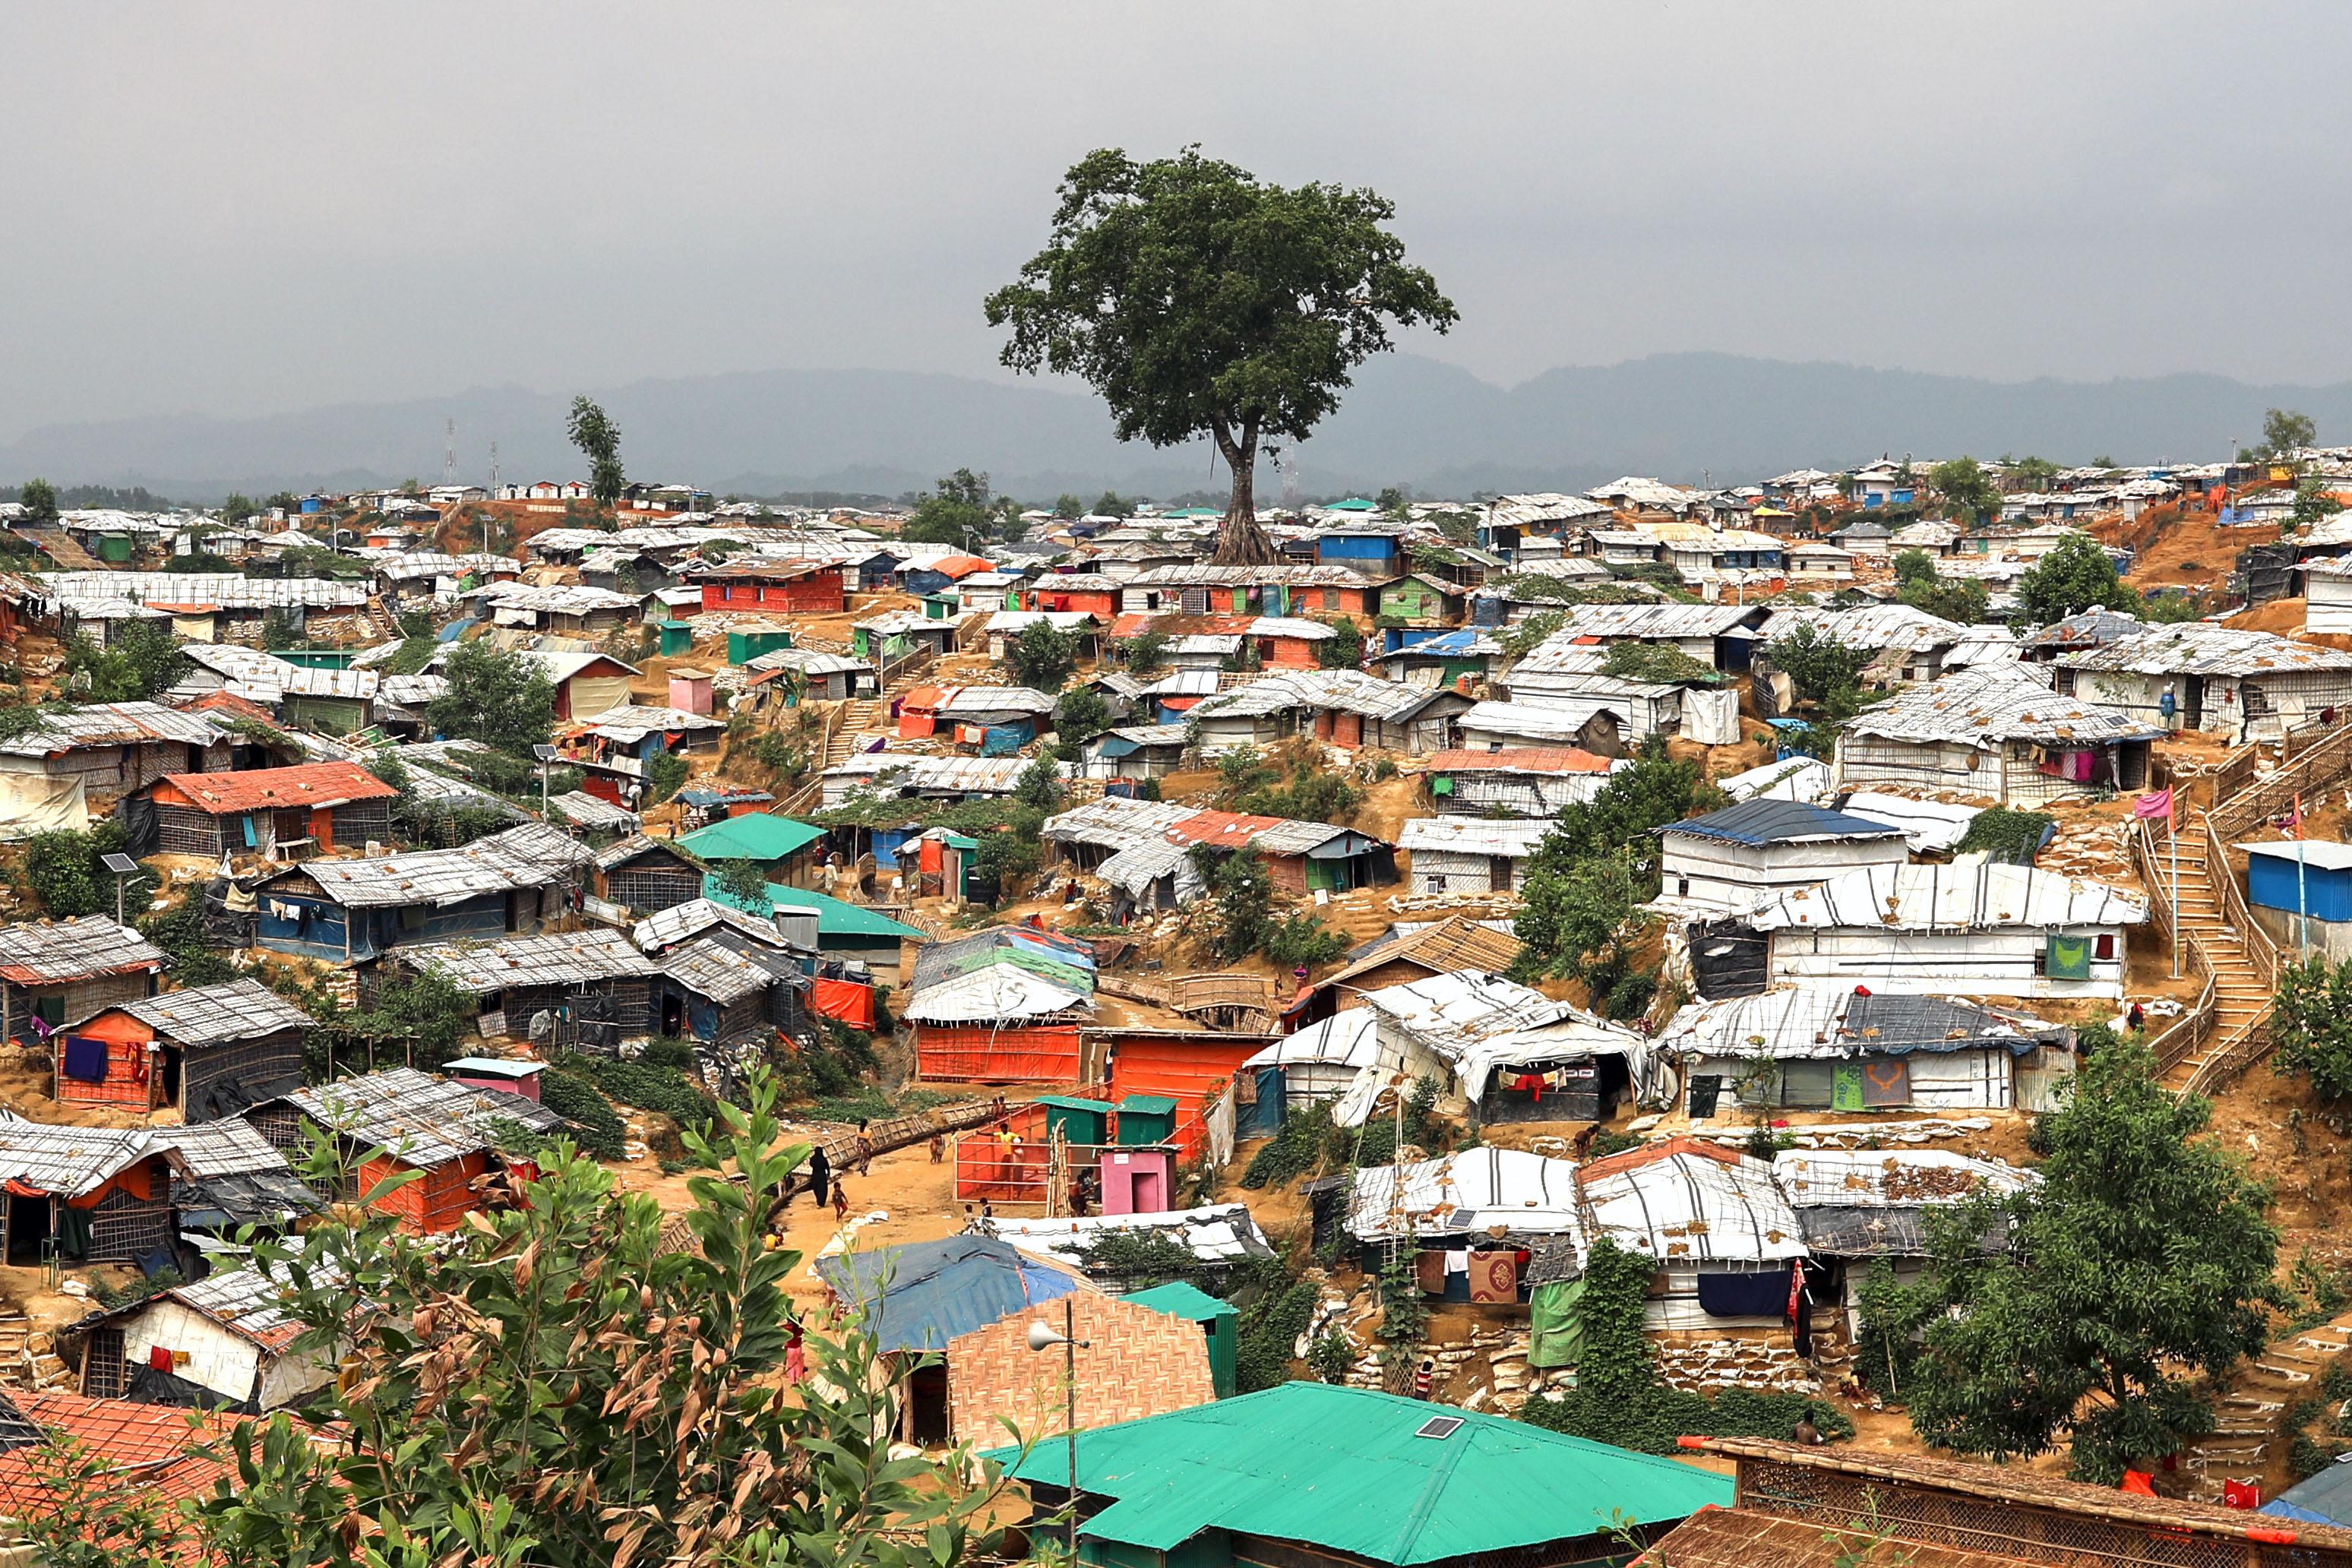 A landscape view  seen in the Balukhali camp in Cox's Bazar Bangladesh.